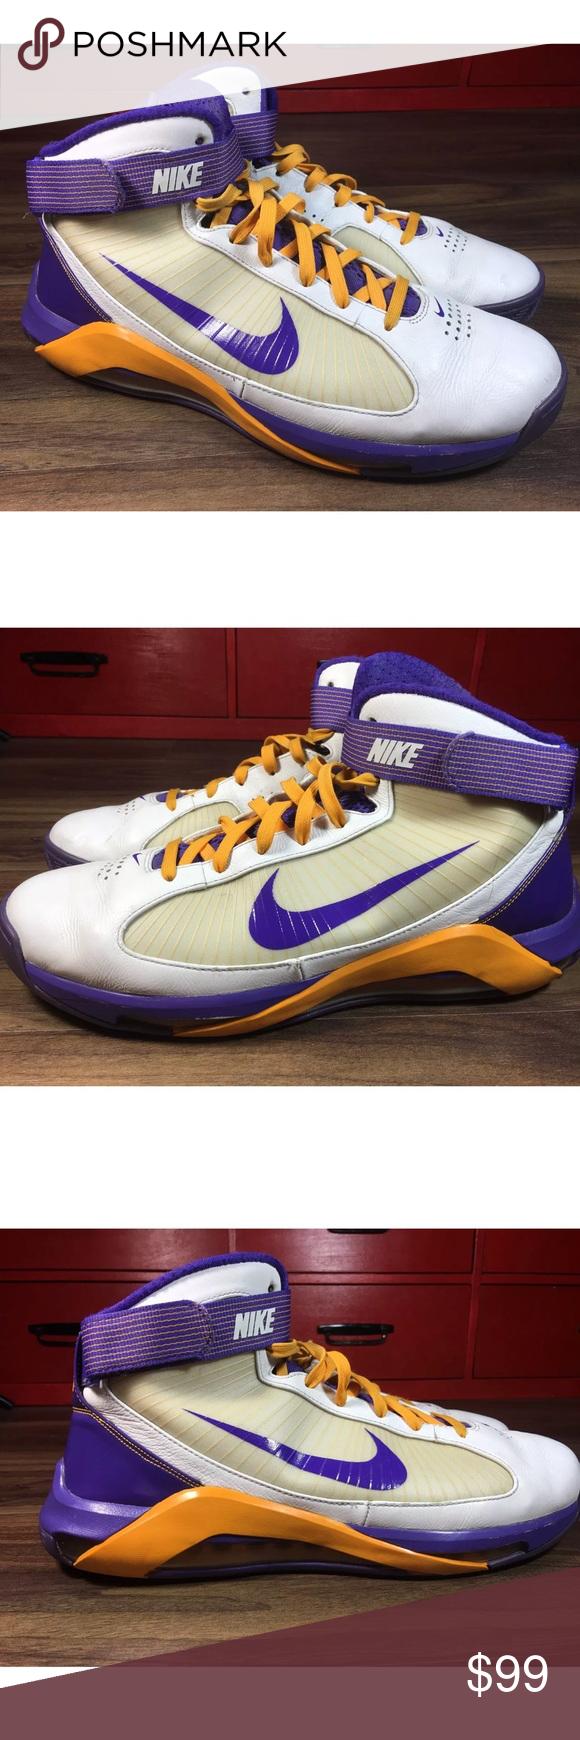 "98fcd5eff1599c Nike Air Max Hypermax ""Pau Gasol PE"" Size 13 2008 Nike Air Max PE"